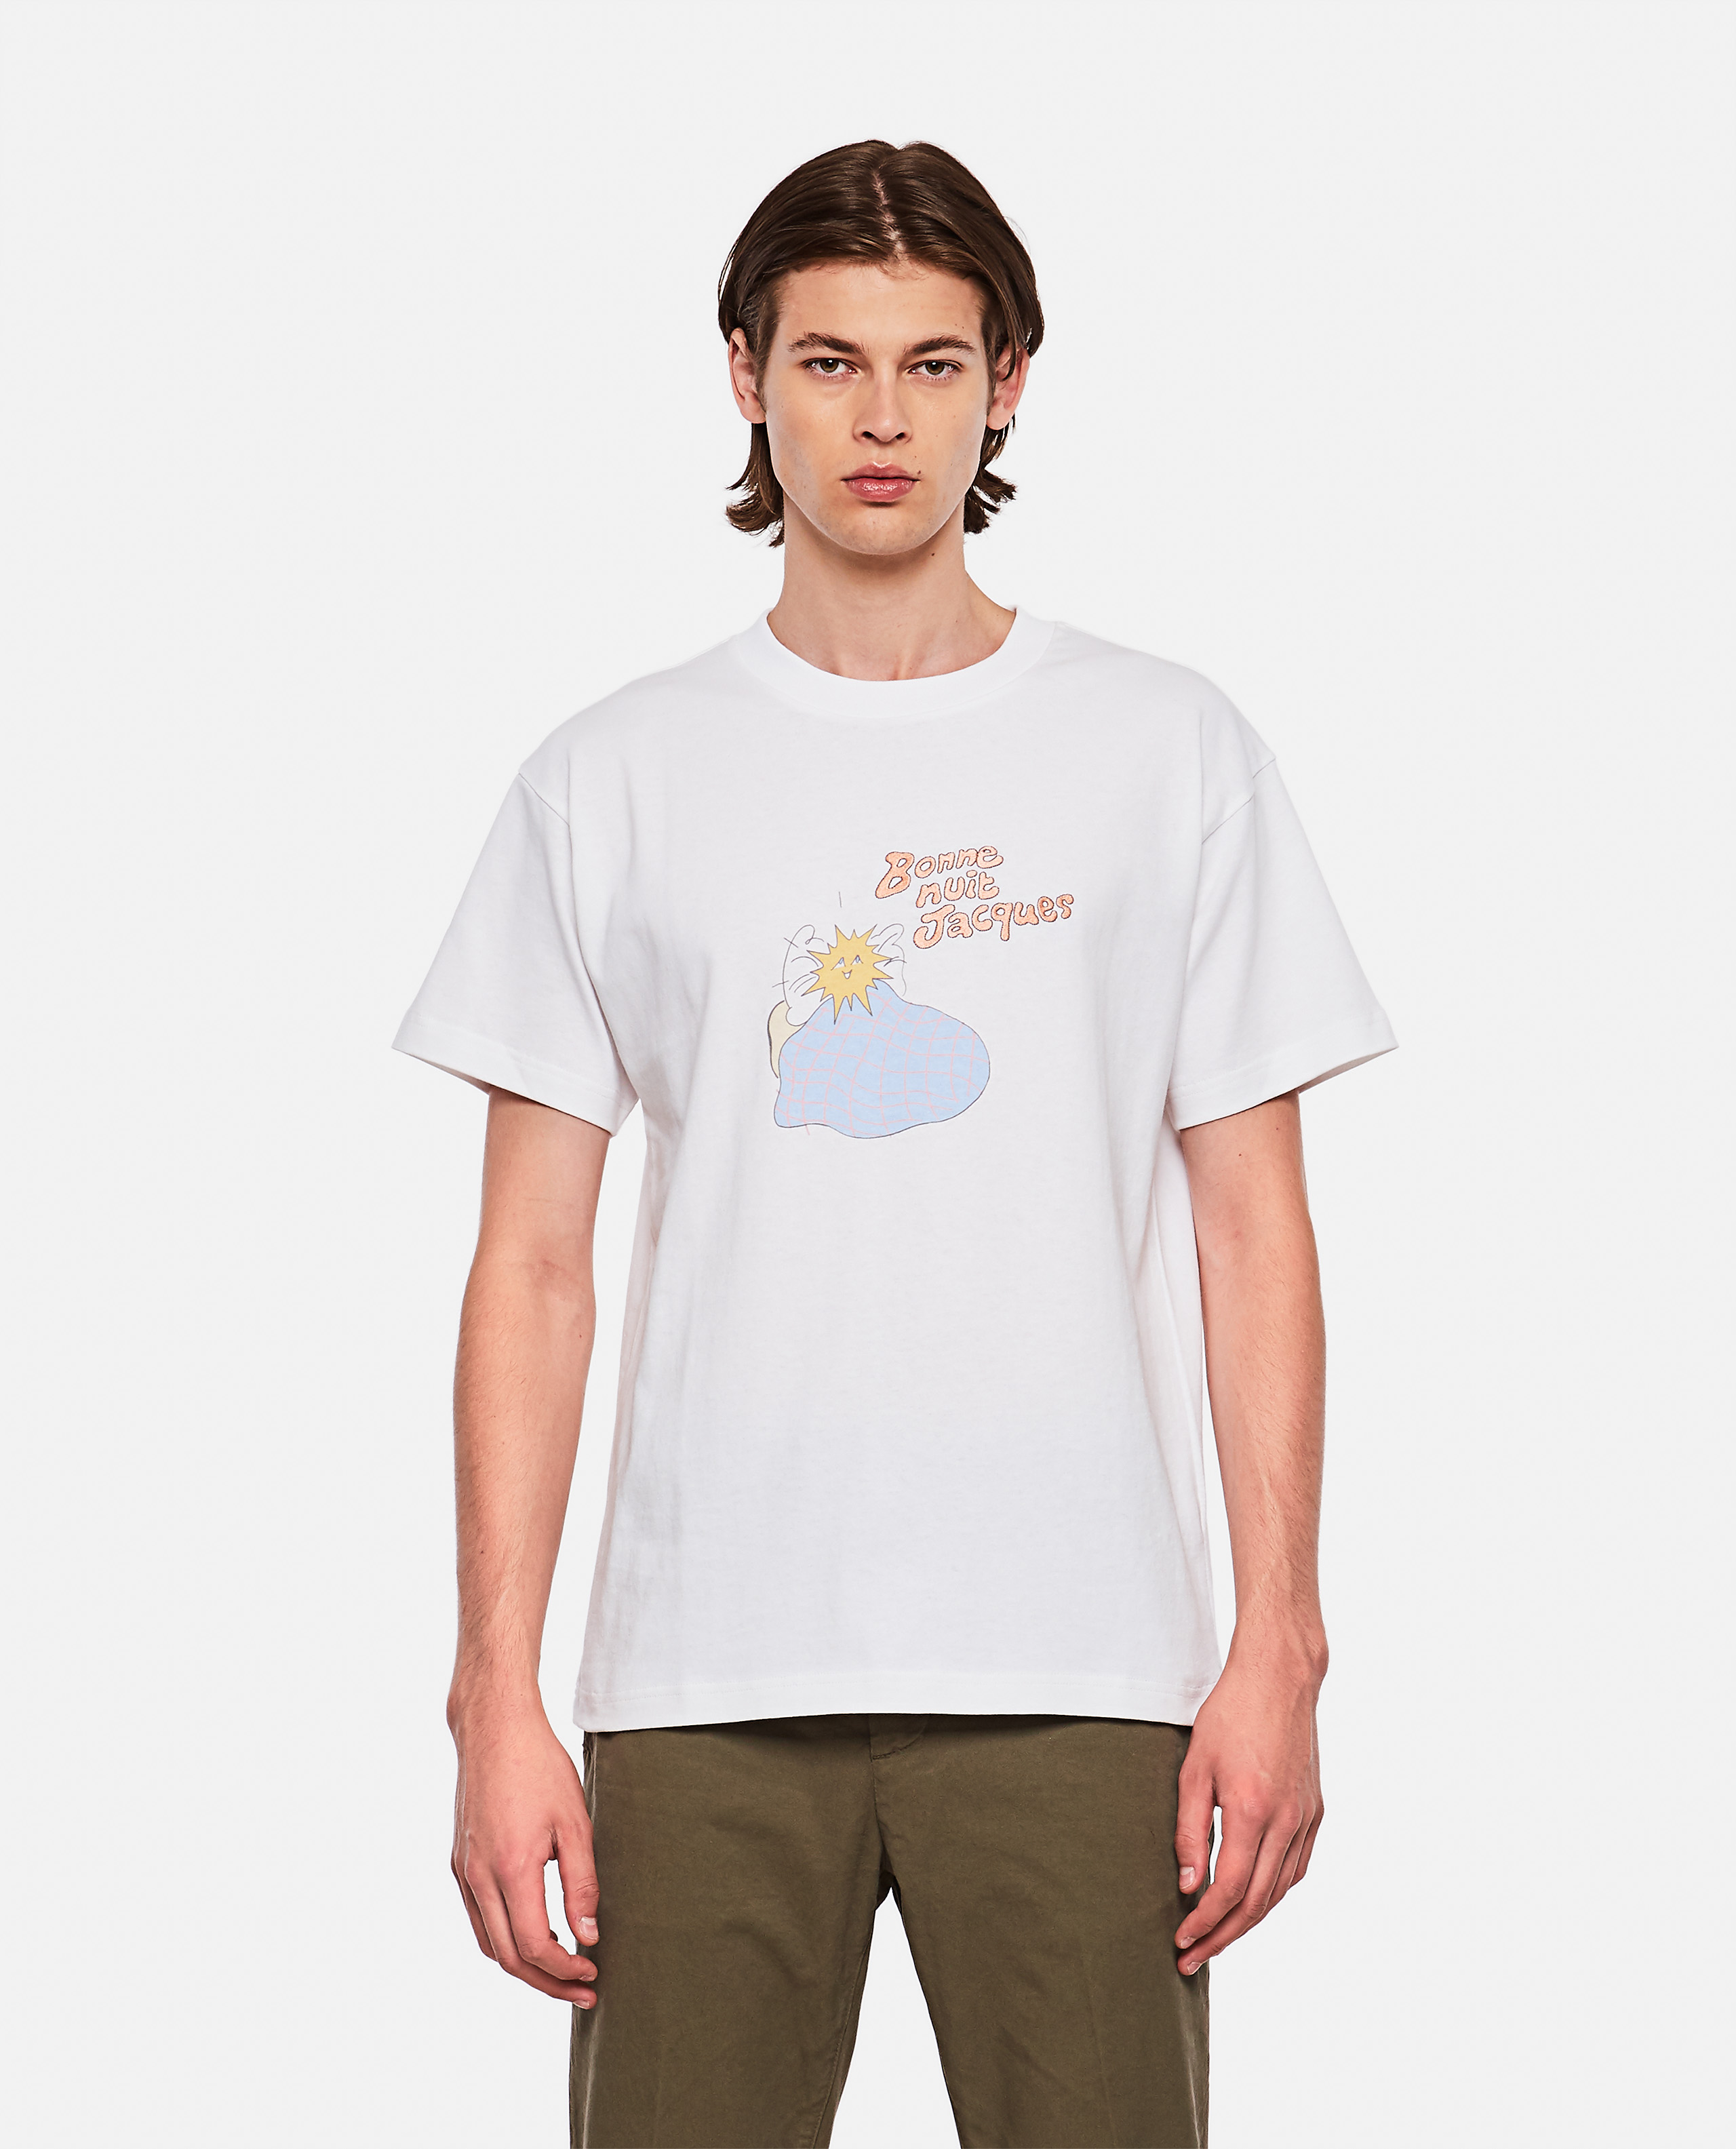 Jacques t-shirts